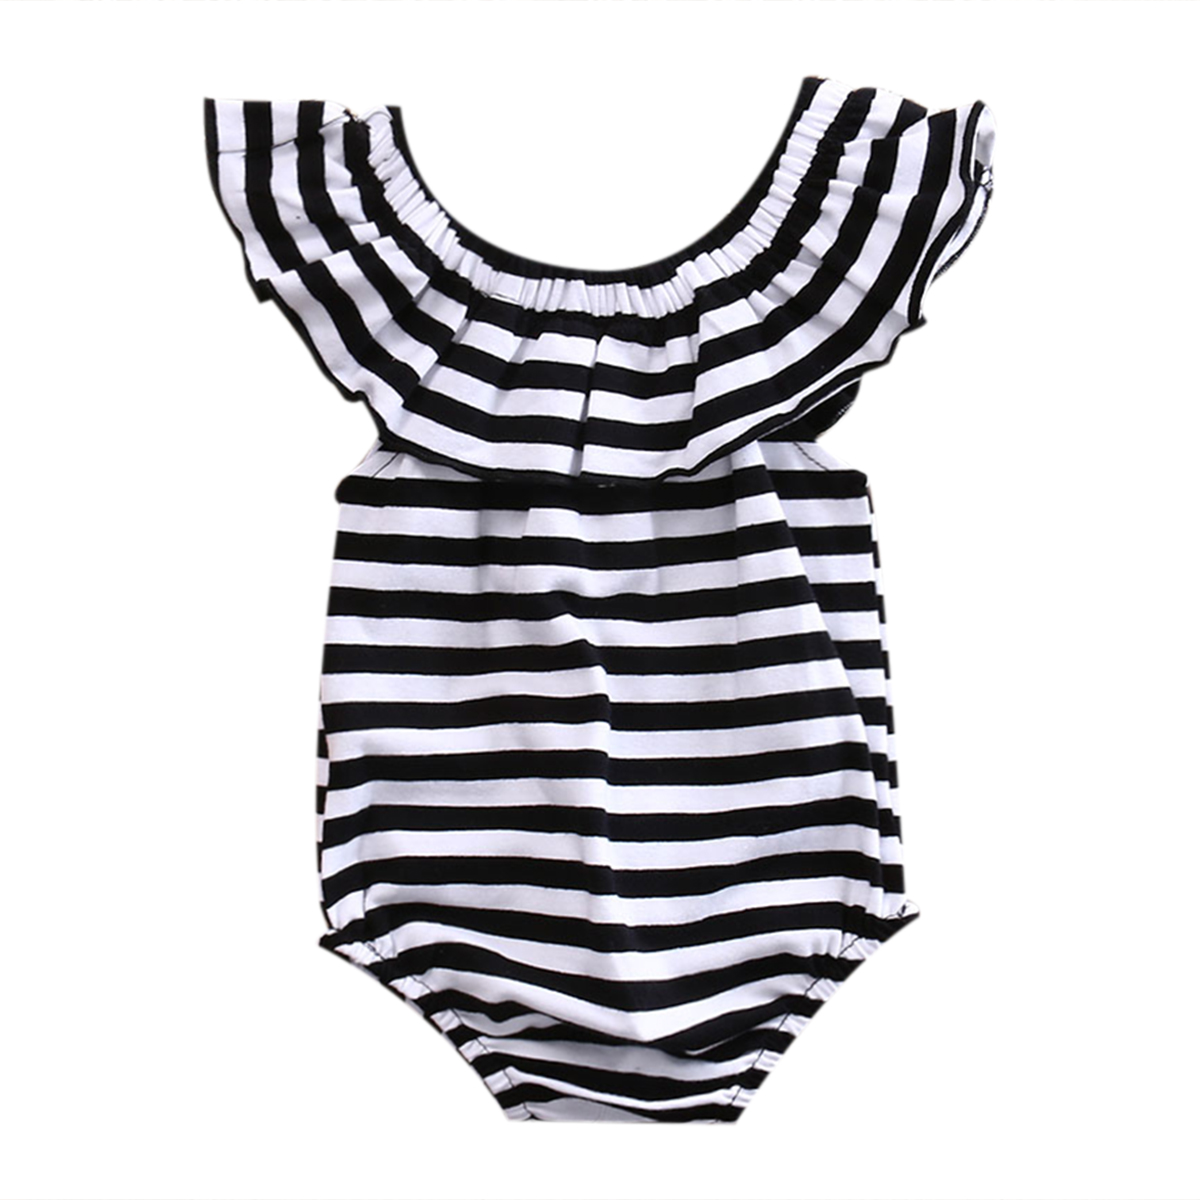 Baby Care Mother & Kids Hot Sale Baby Romper Suit Partner Super Utility Baby Lengthening Piece Jumpsuit Bodysuit Extender Patch Super Practical